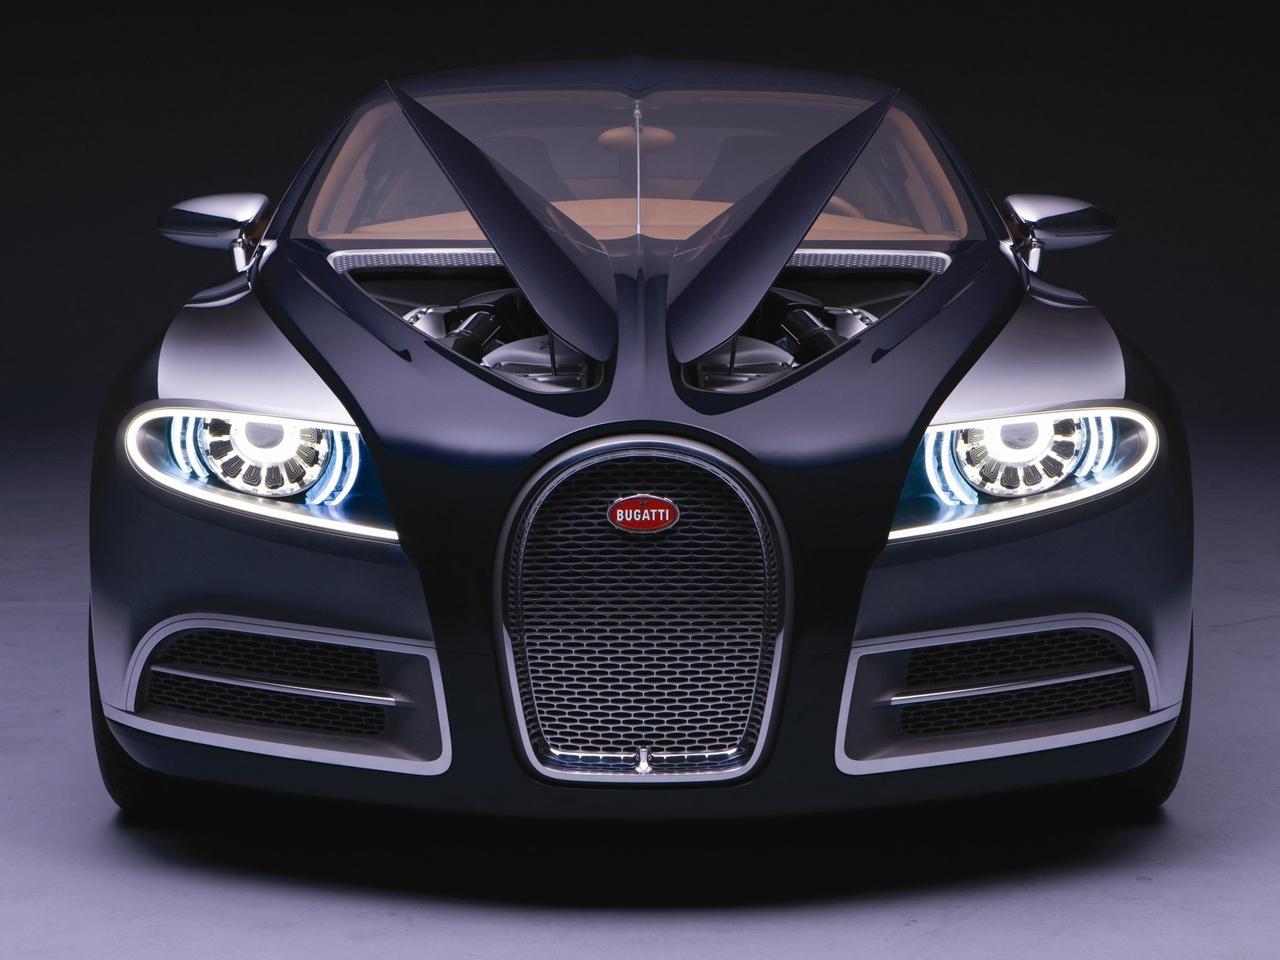 Concpet car, Bugatti, wallpaper, скачать фото обои на рабочий стол